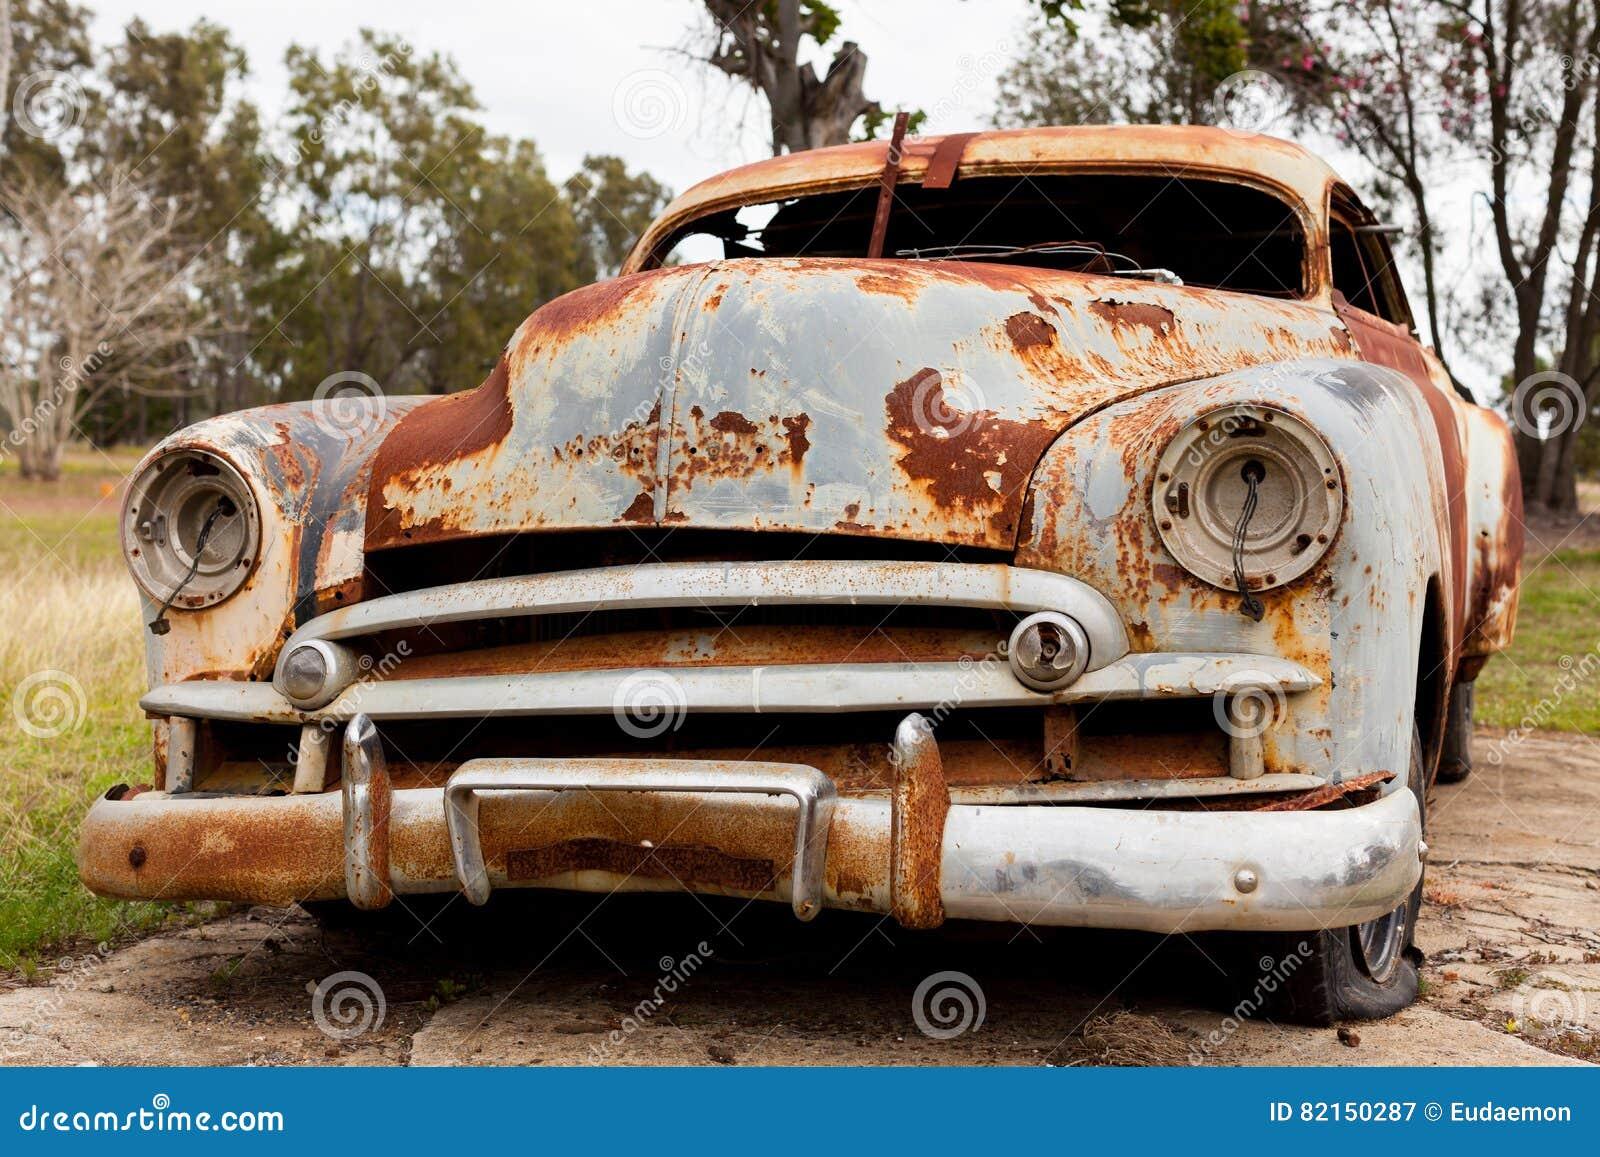 Rusty Car Stock Photo | CartoonDealer.com #81339732